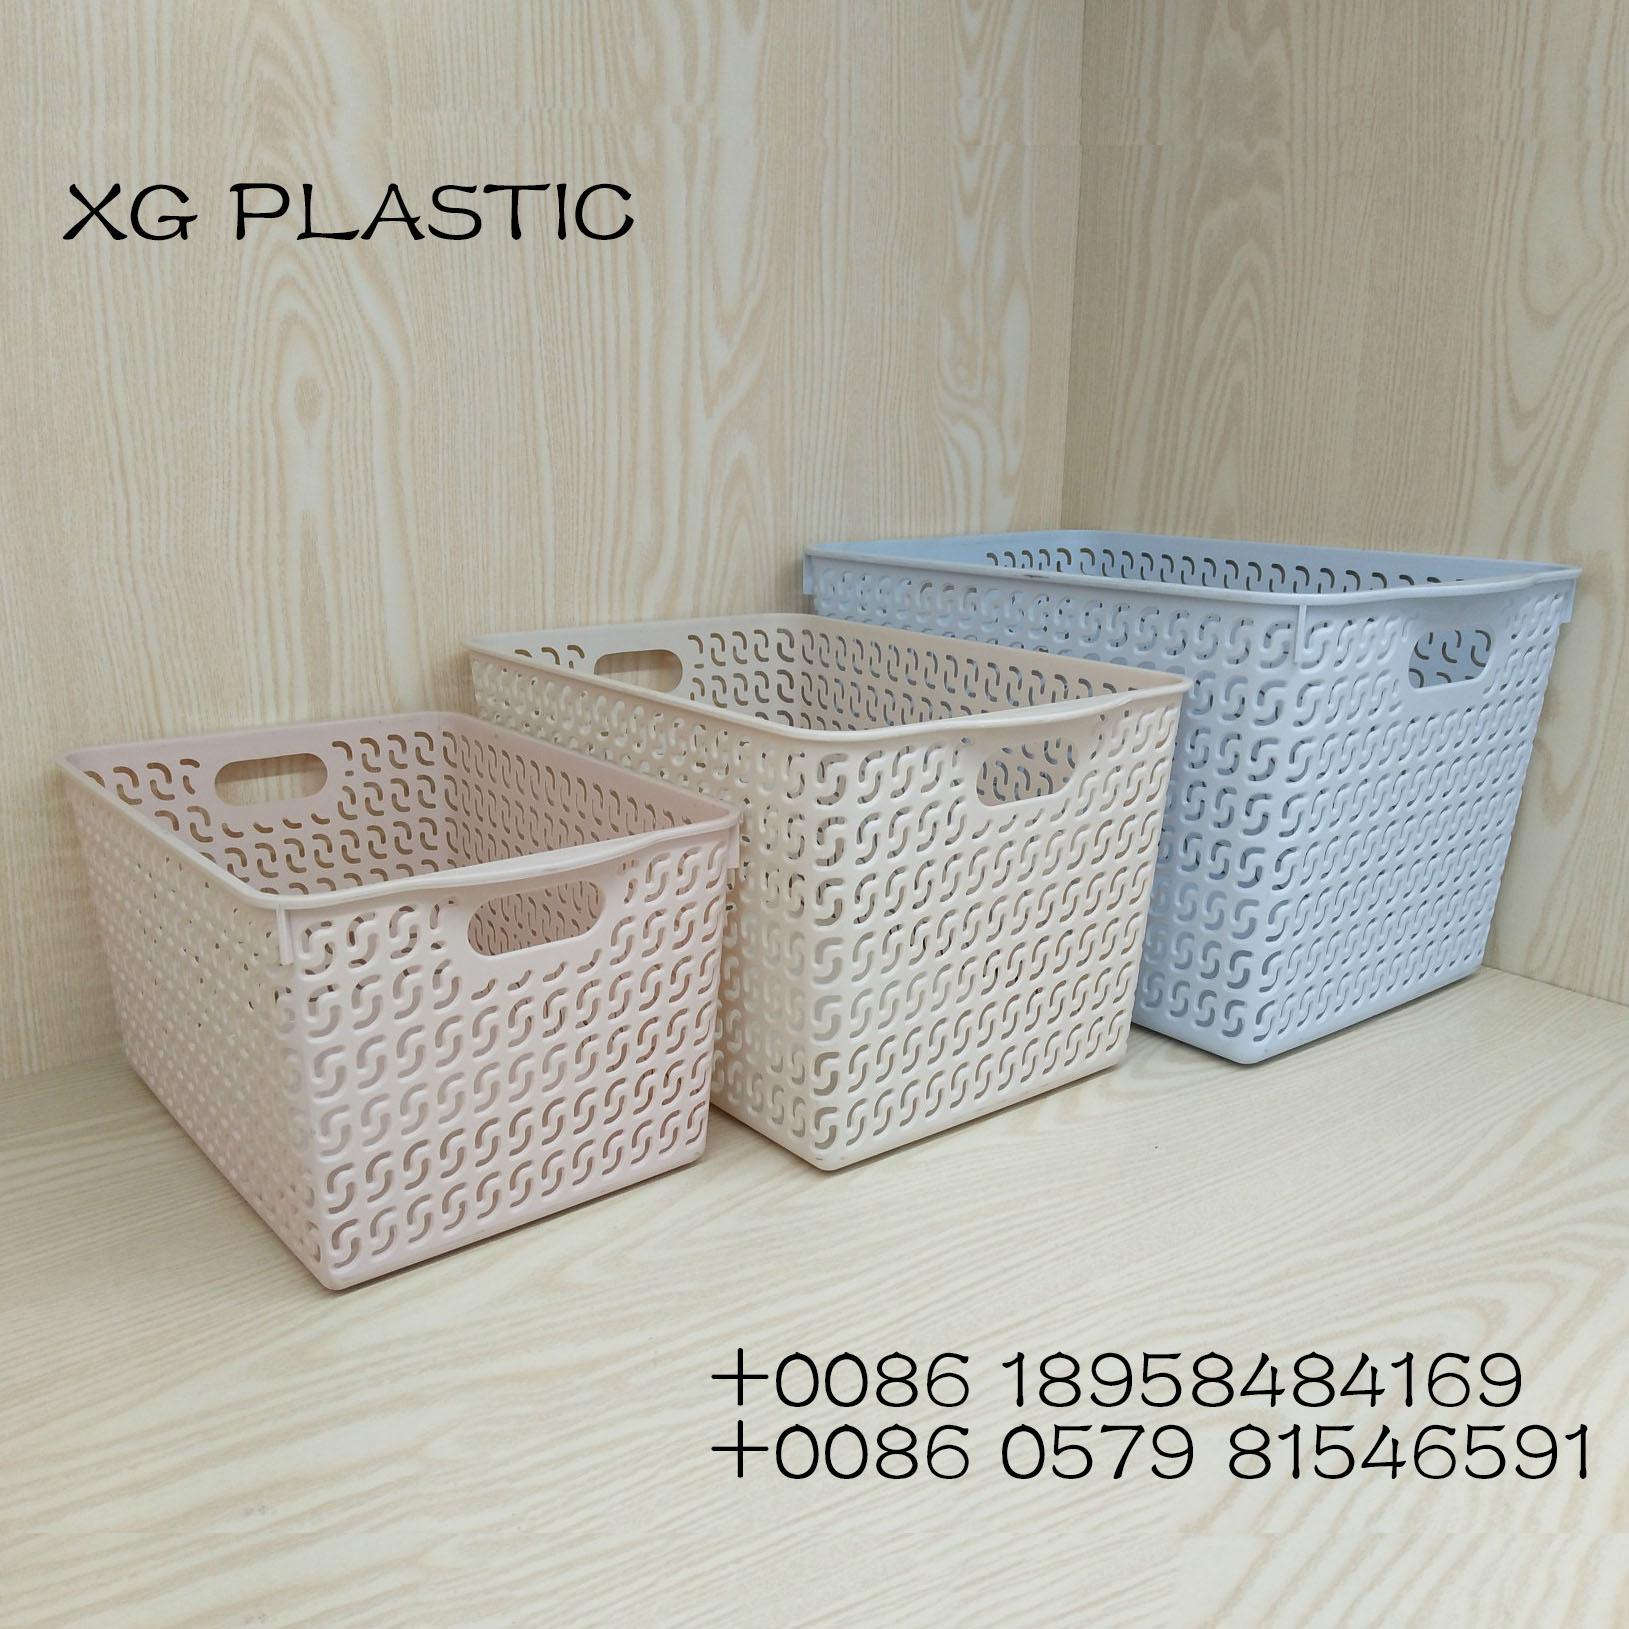 Supply Plastic Storage Baskets Bins Organizer With Handles for dimensions 1629 X 1629